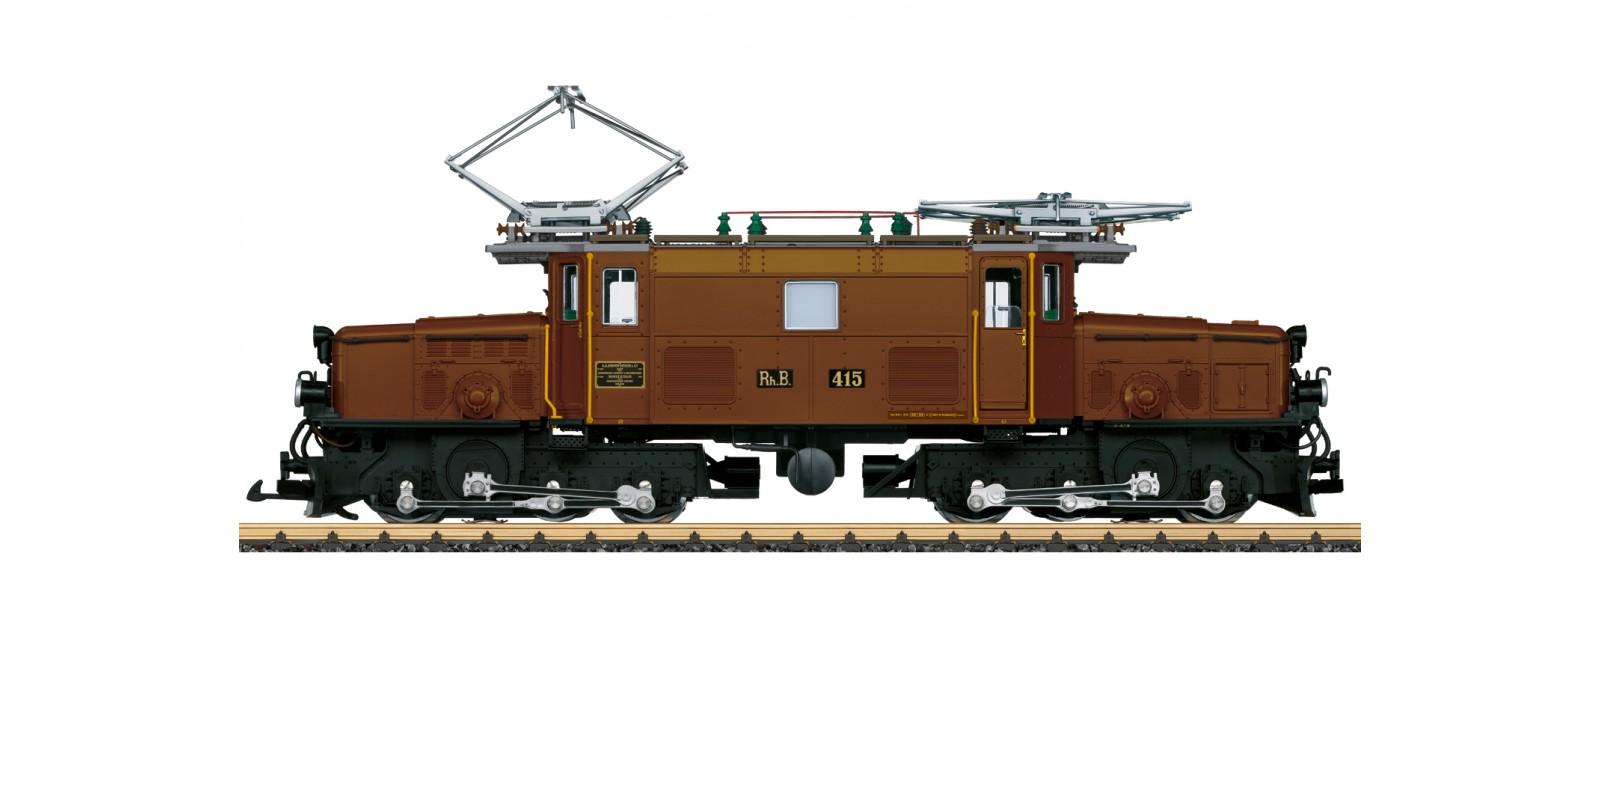 L23407 Class Ge 6/6 I Electric Locomotive